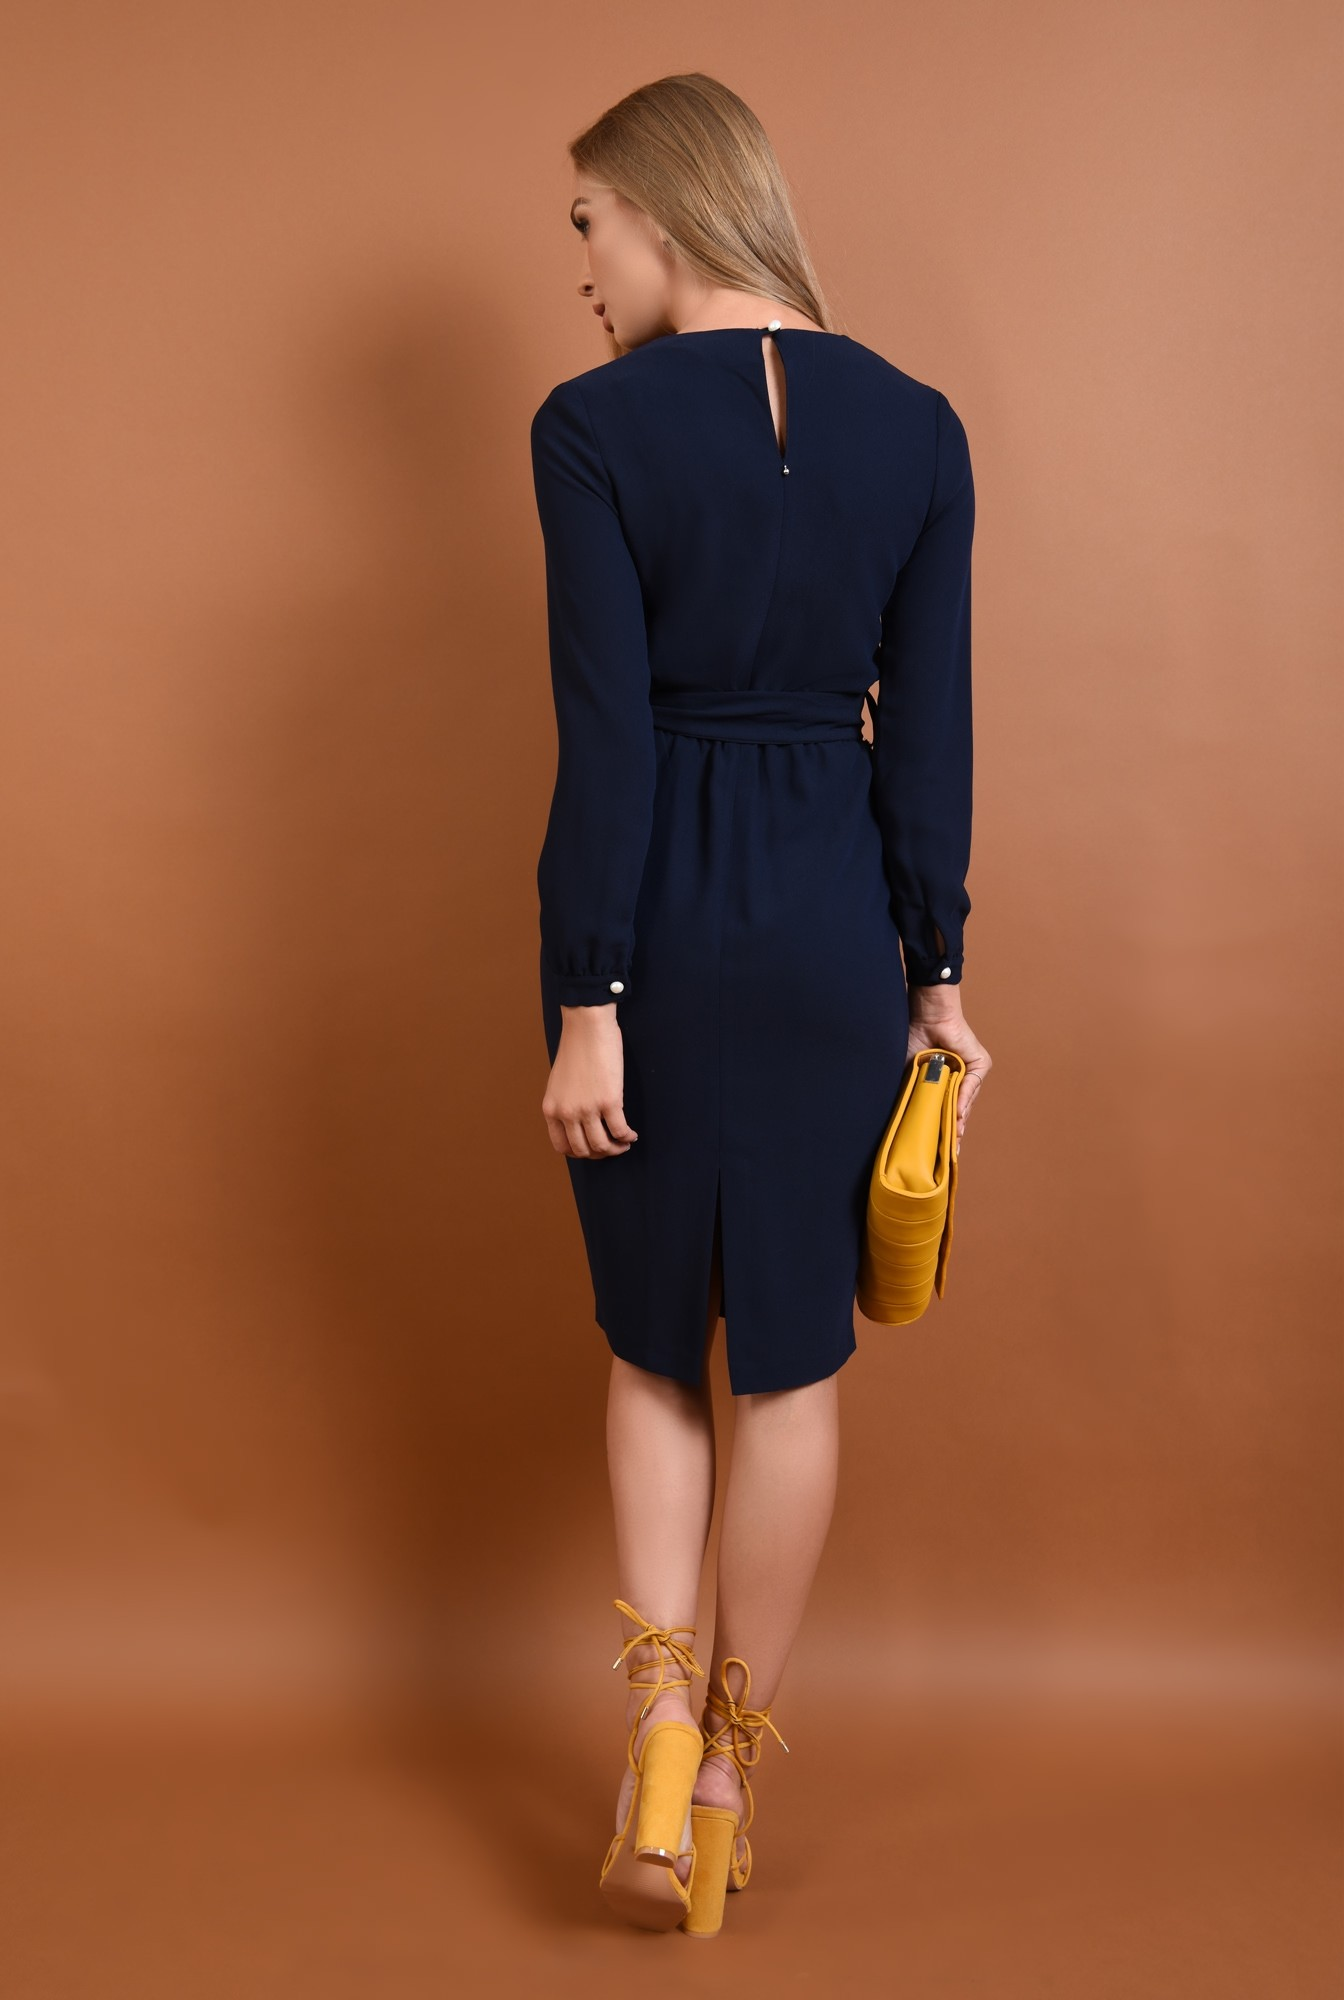 1 - rochie de zi, midi, albastru, bleumarin, maneci lungi, mansete